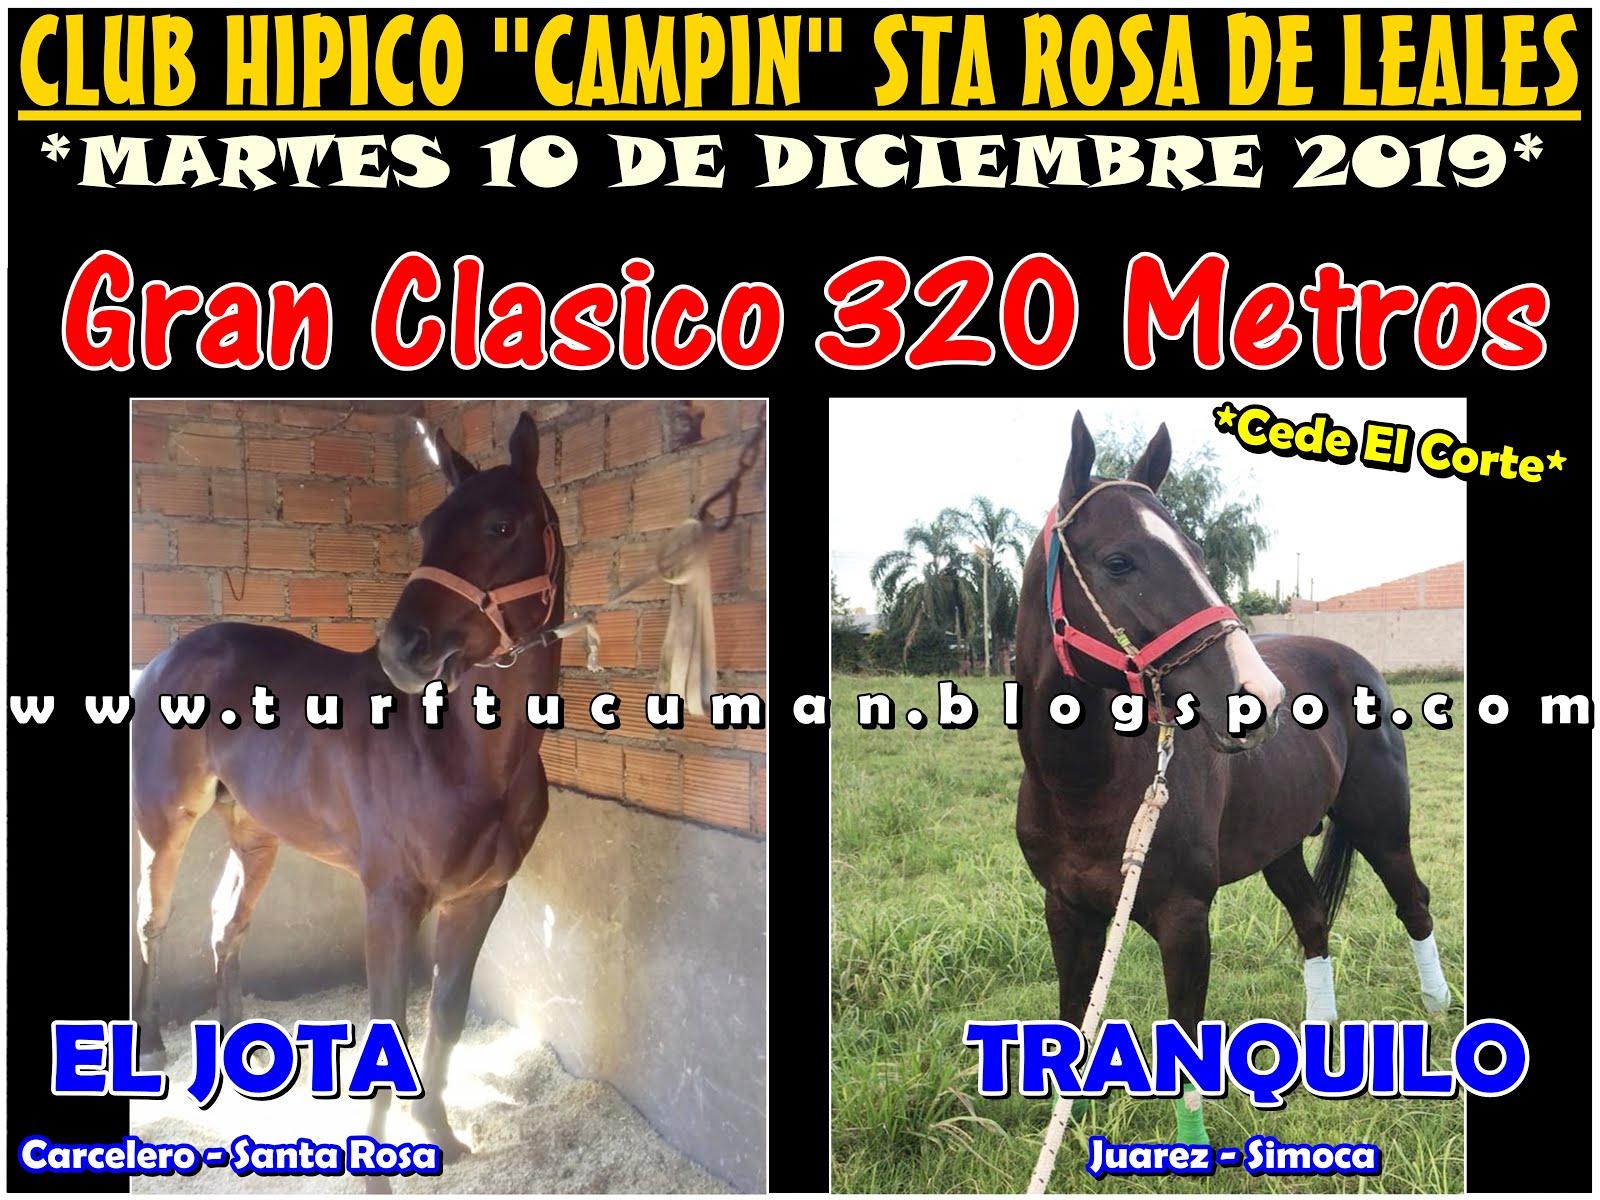 TRANQUILO VS JOTA